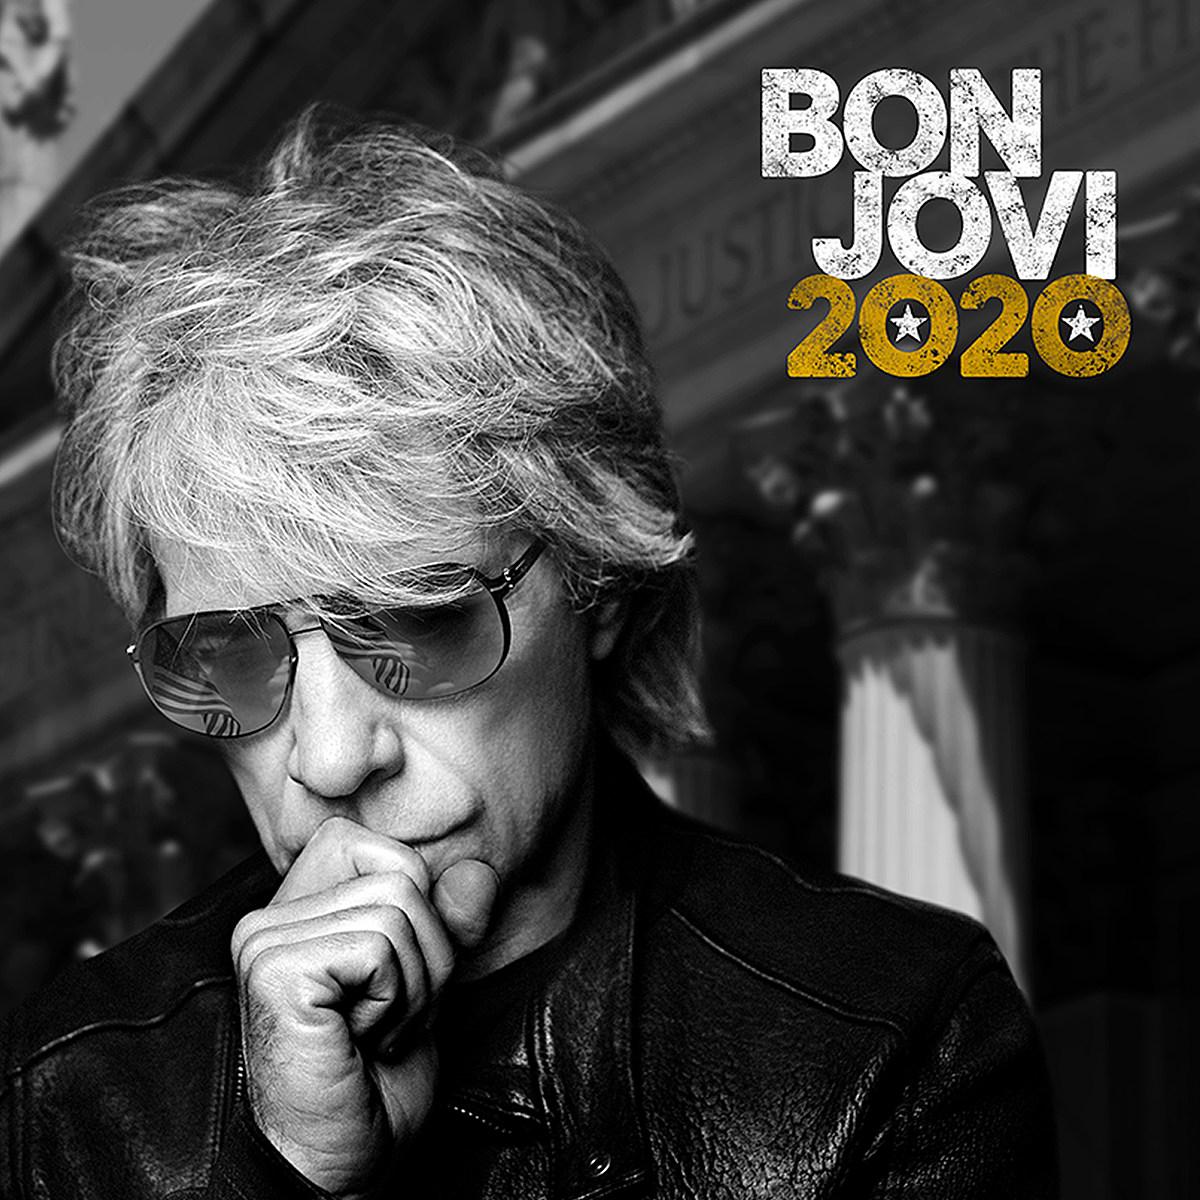 Bon Jovi Share 'Limitless' Single and '2020' Album Cover Art